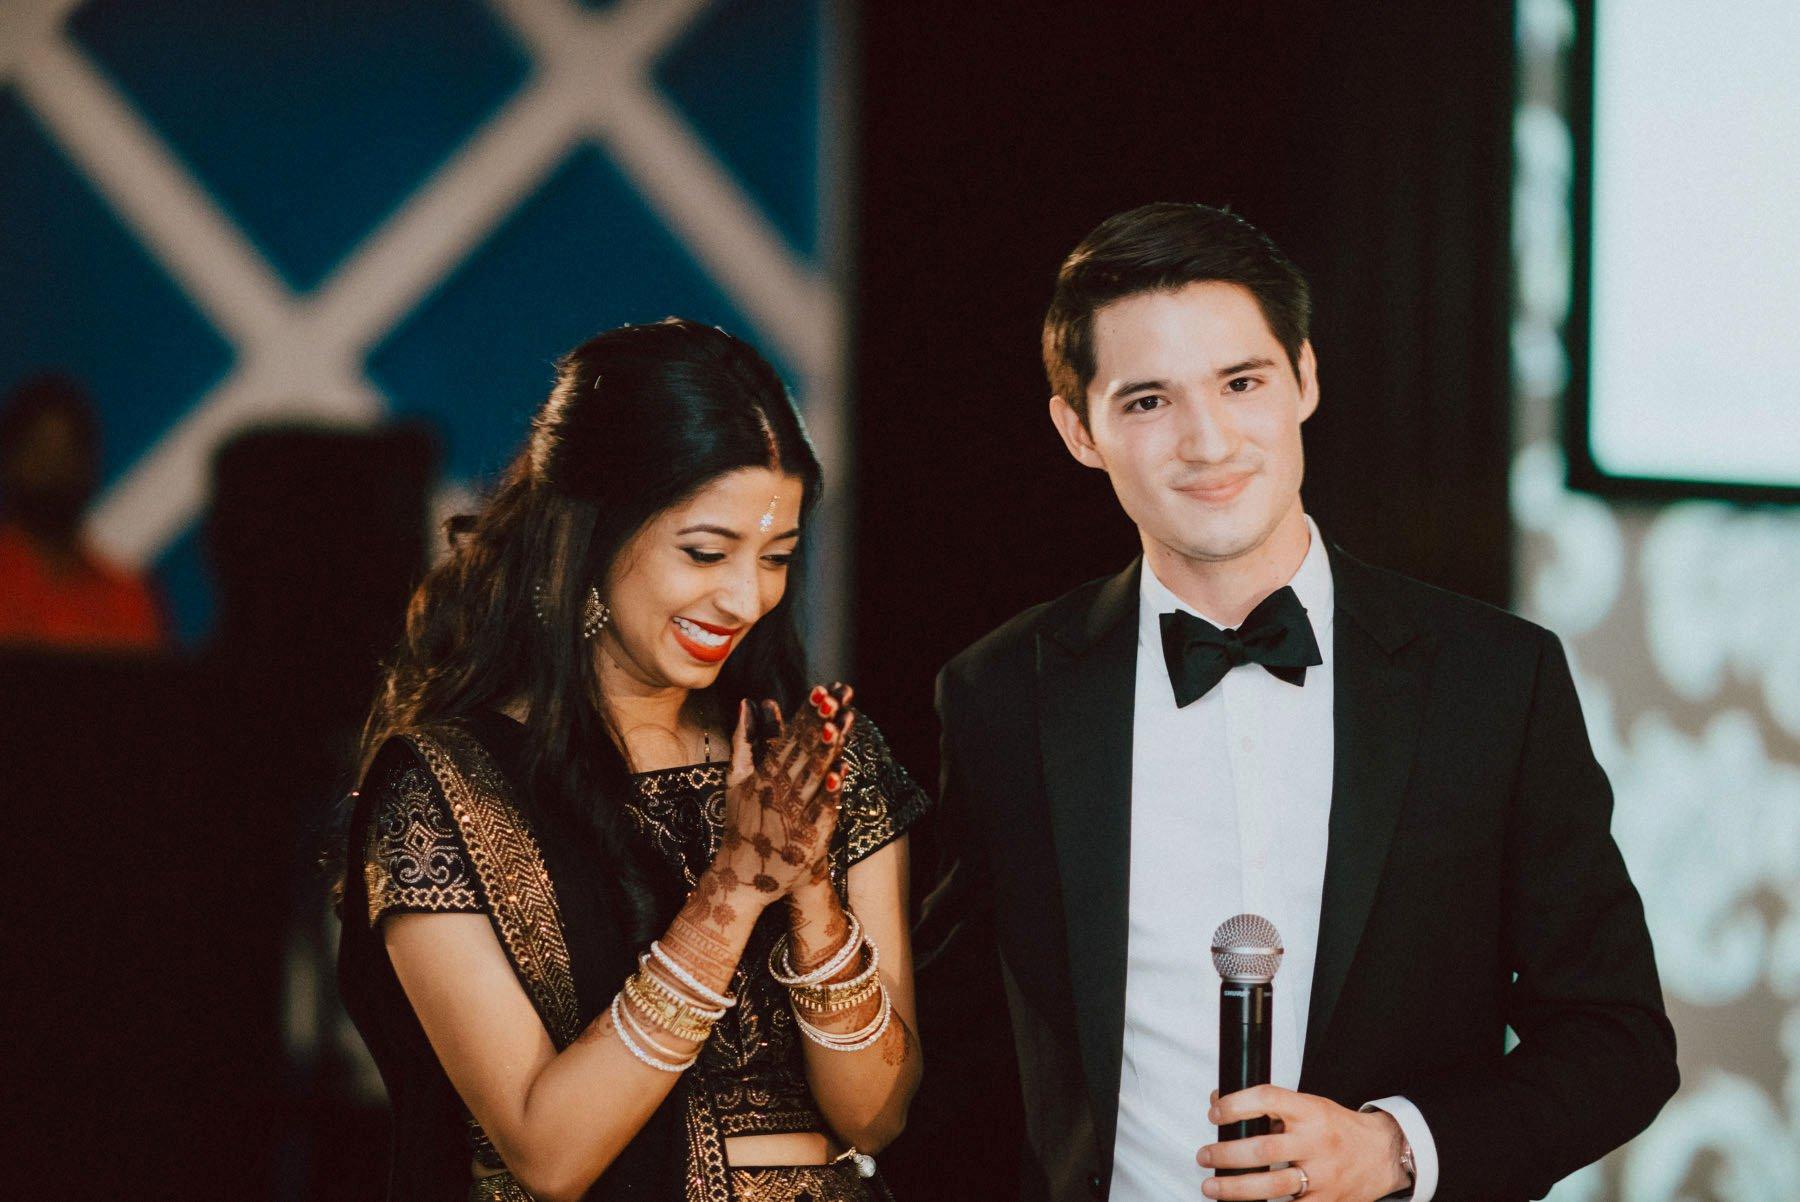 vie-philadelphia-indian-wedding-116.jpg